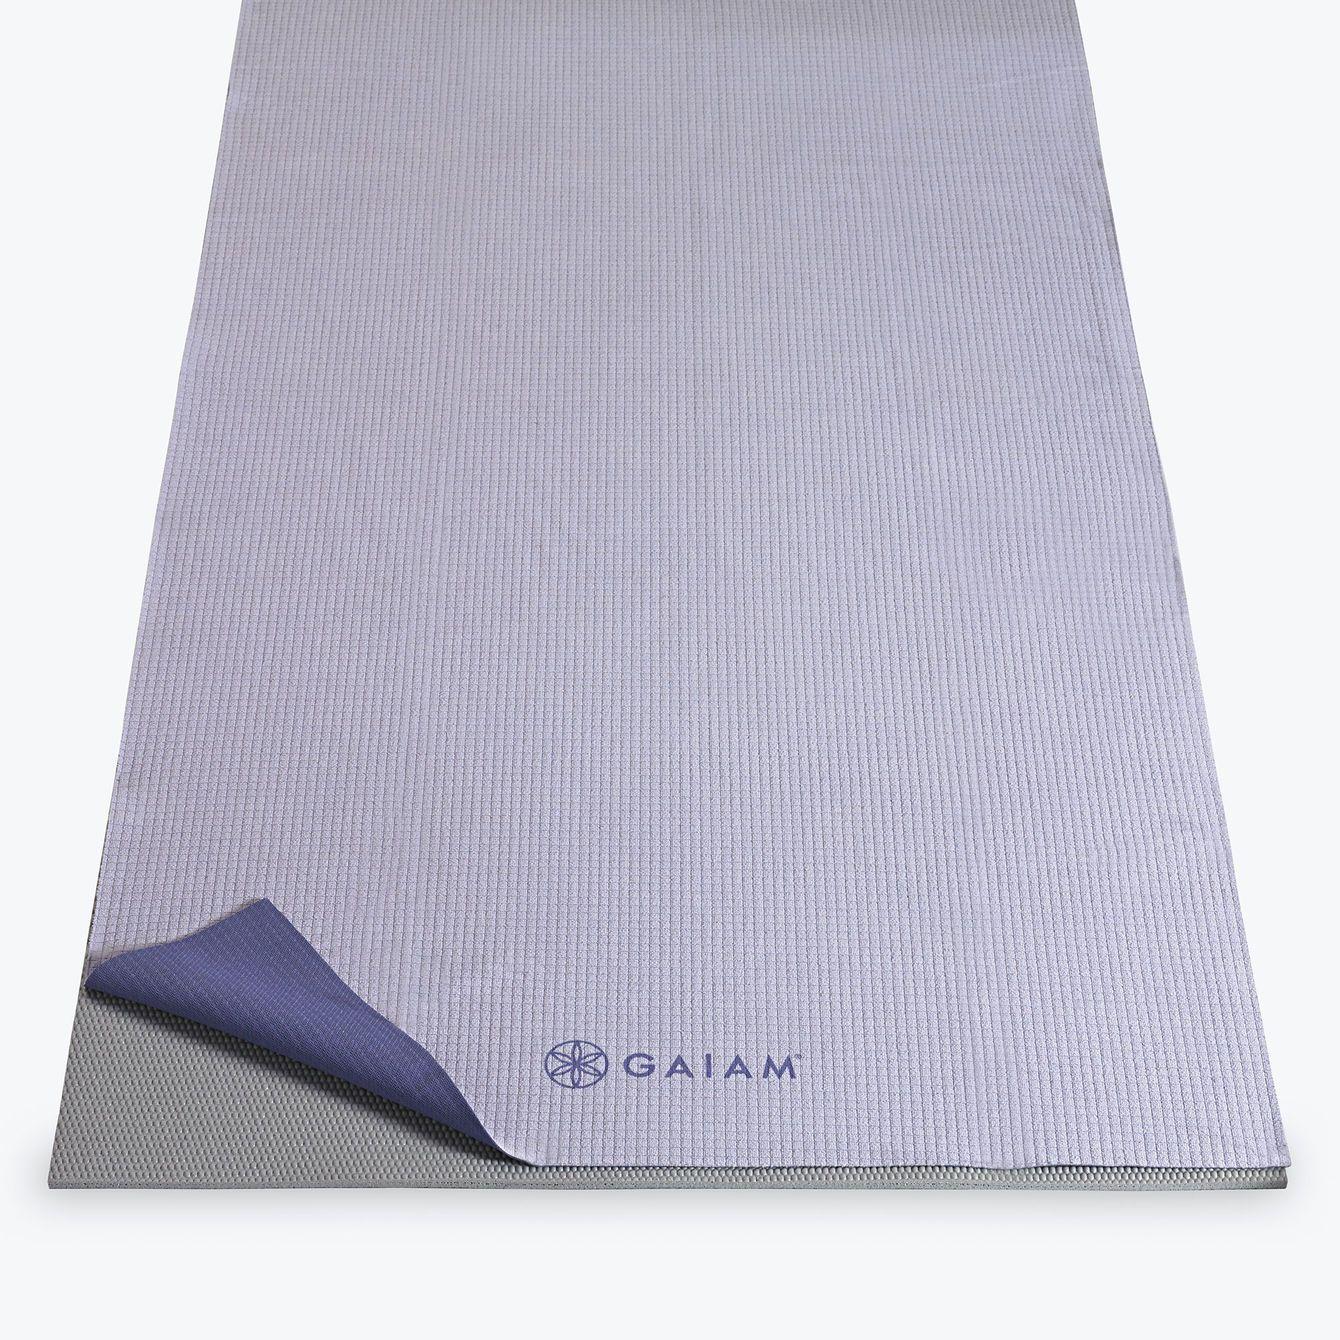 No Slip Yoga Towel With Images Yoga Mat Towel Yoga Towel Yoga Mat